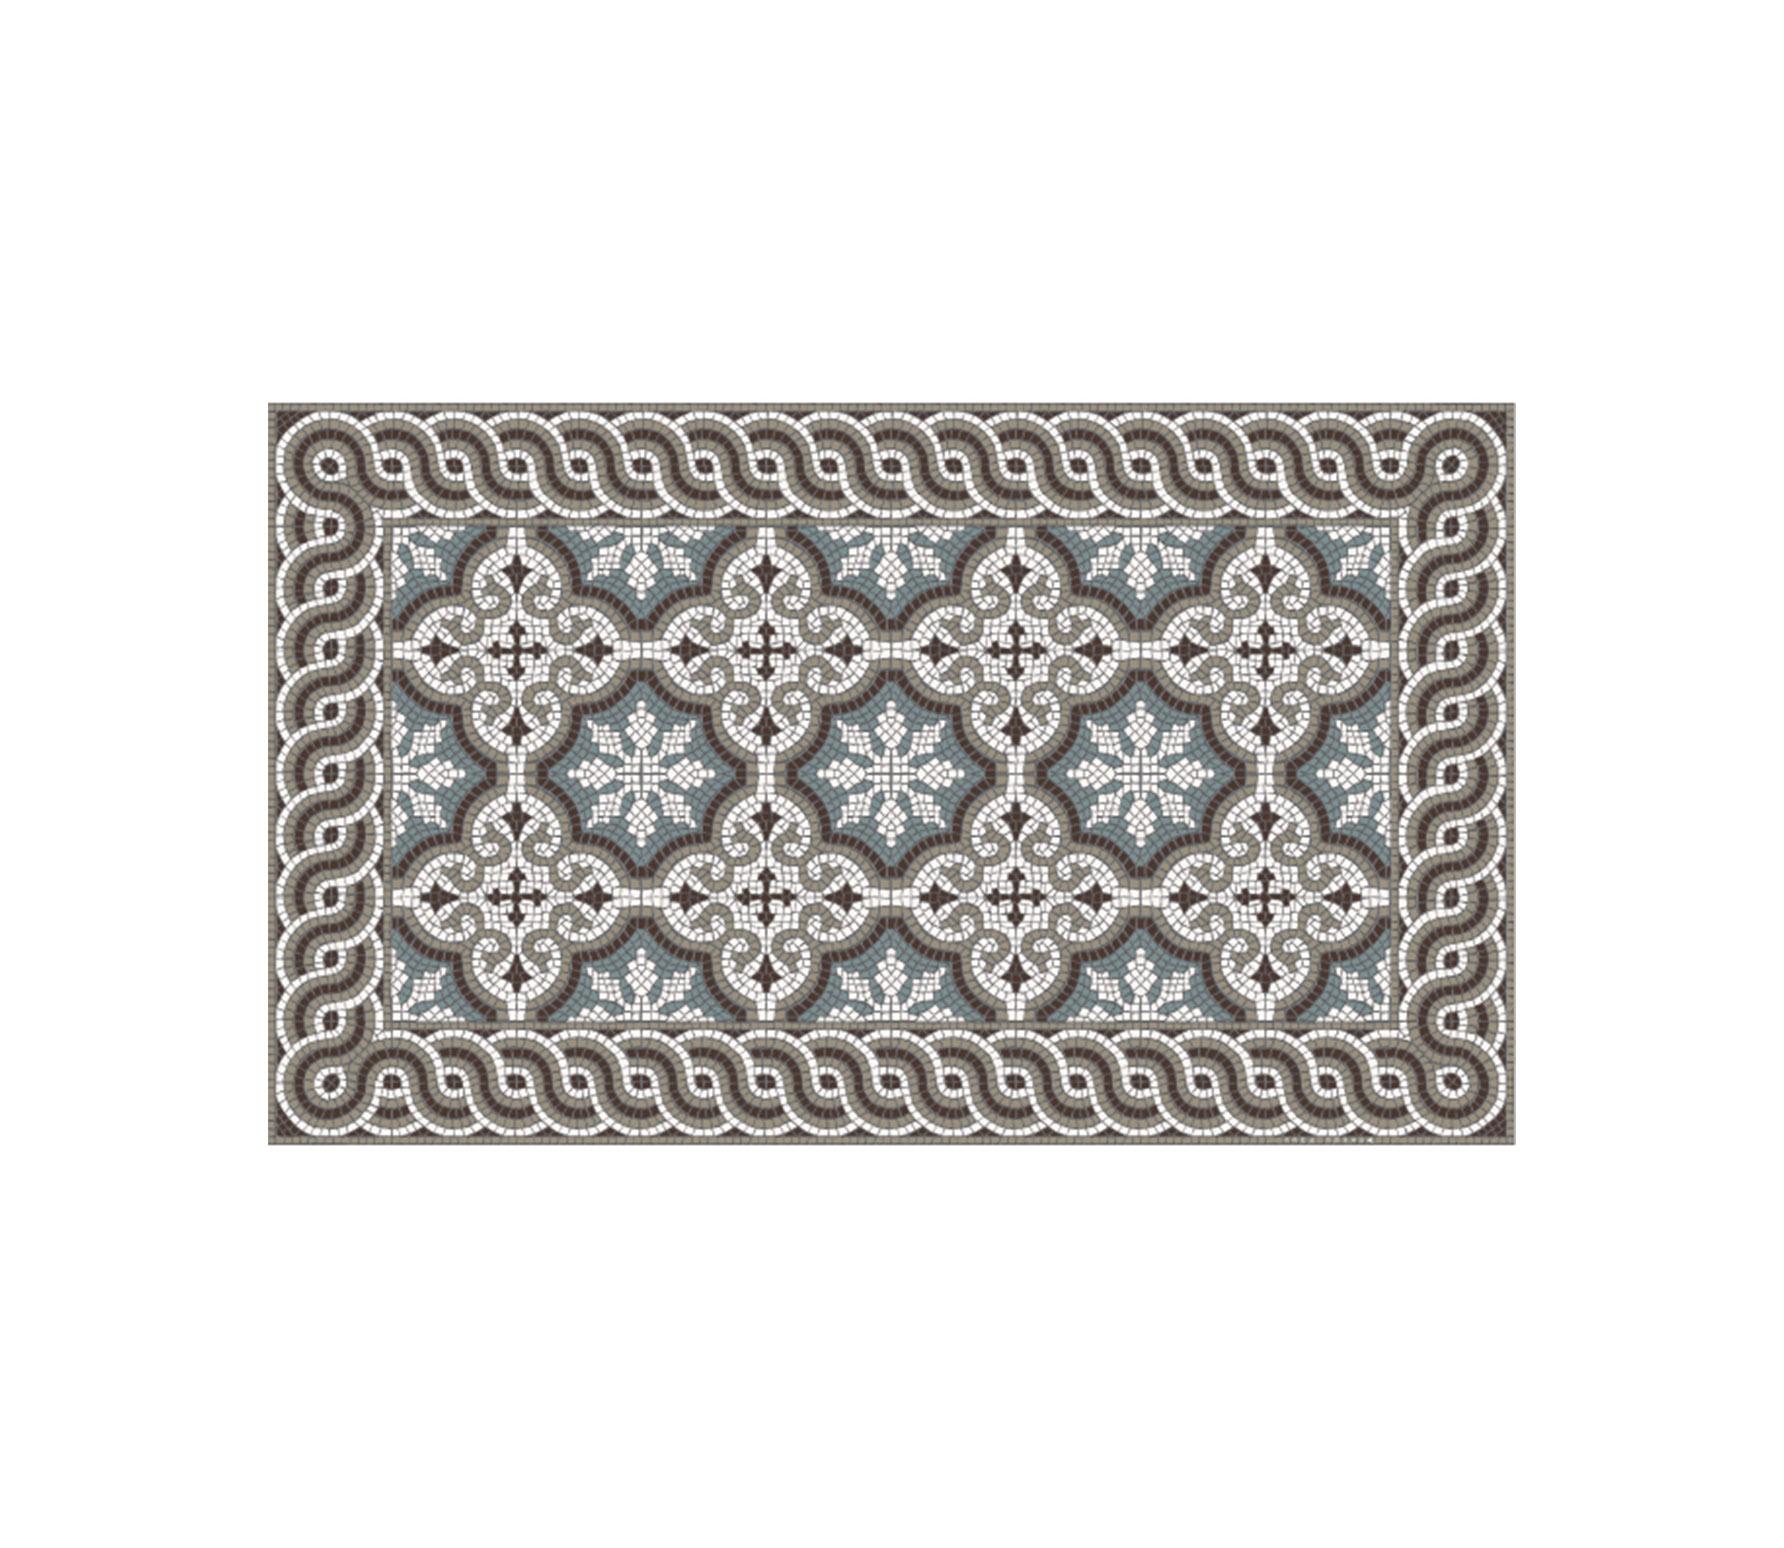 Beija Flor Mountain Mosaic vloermat, div. afmetingen large 70x120 cm